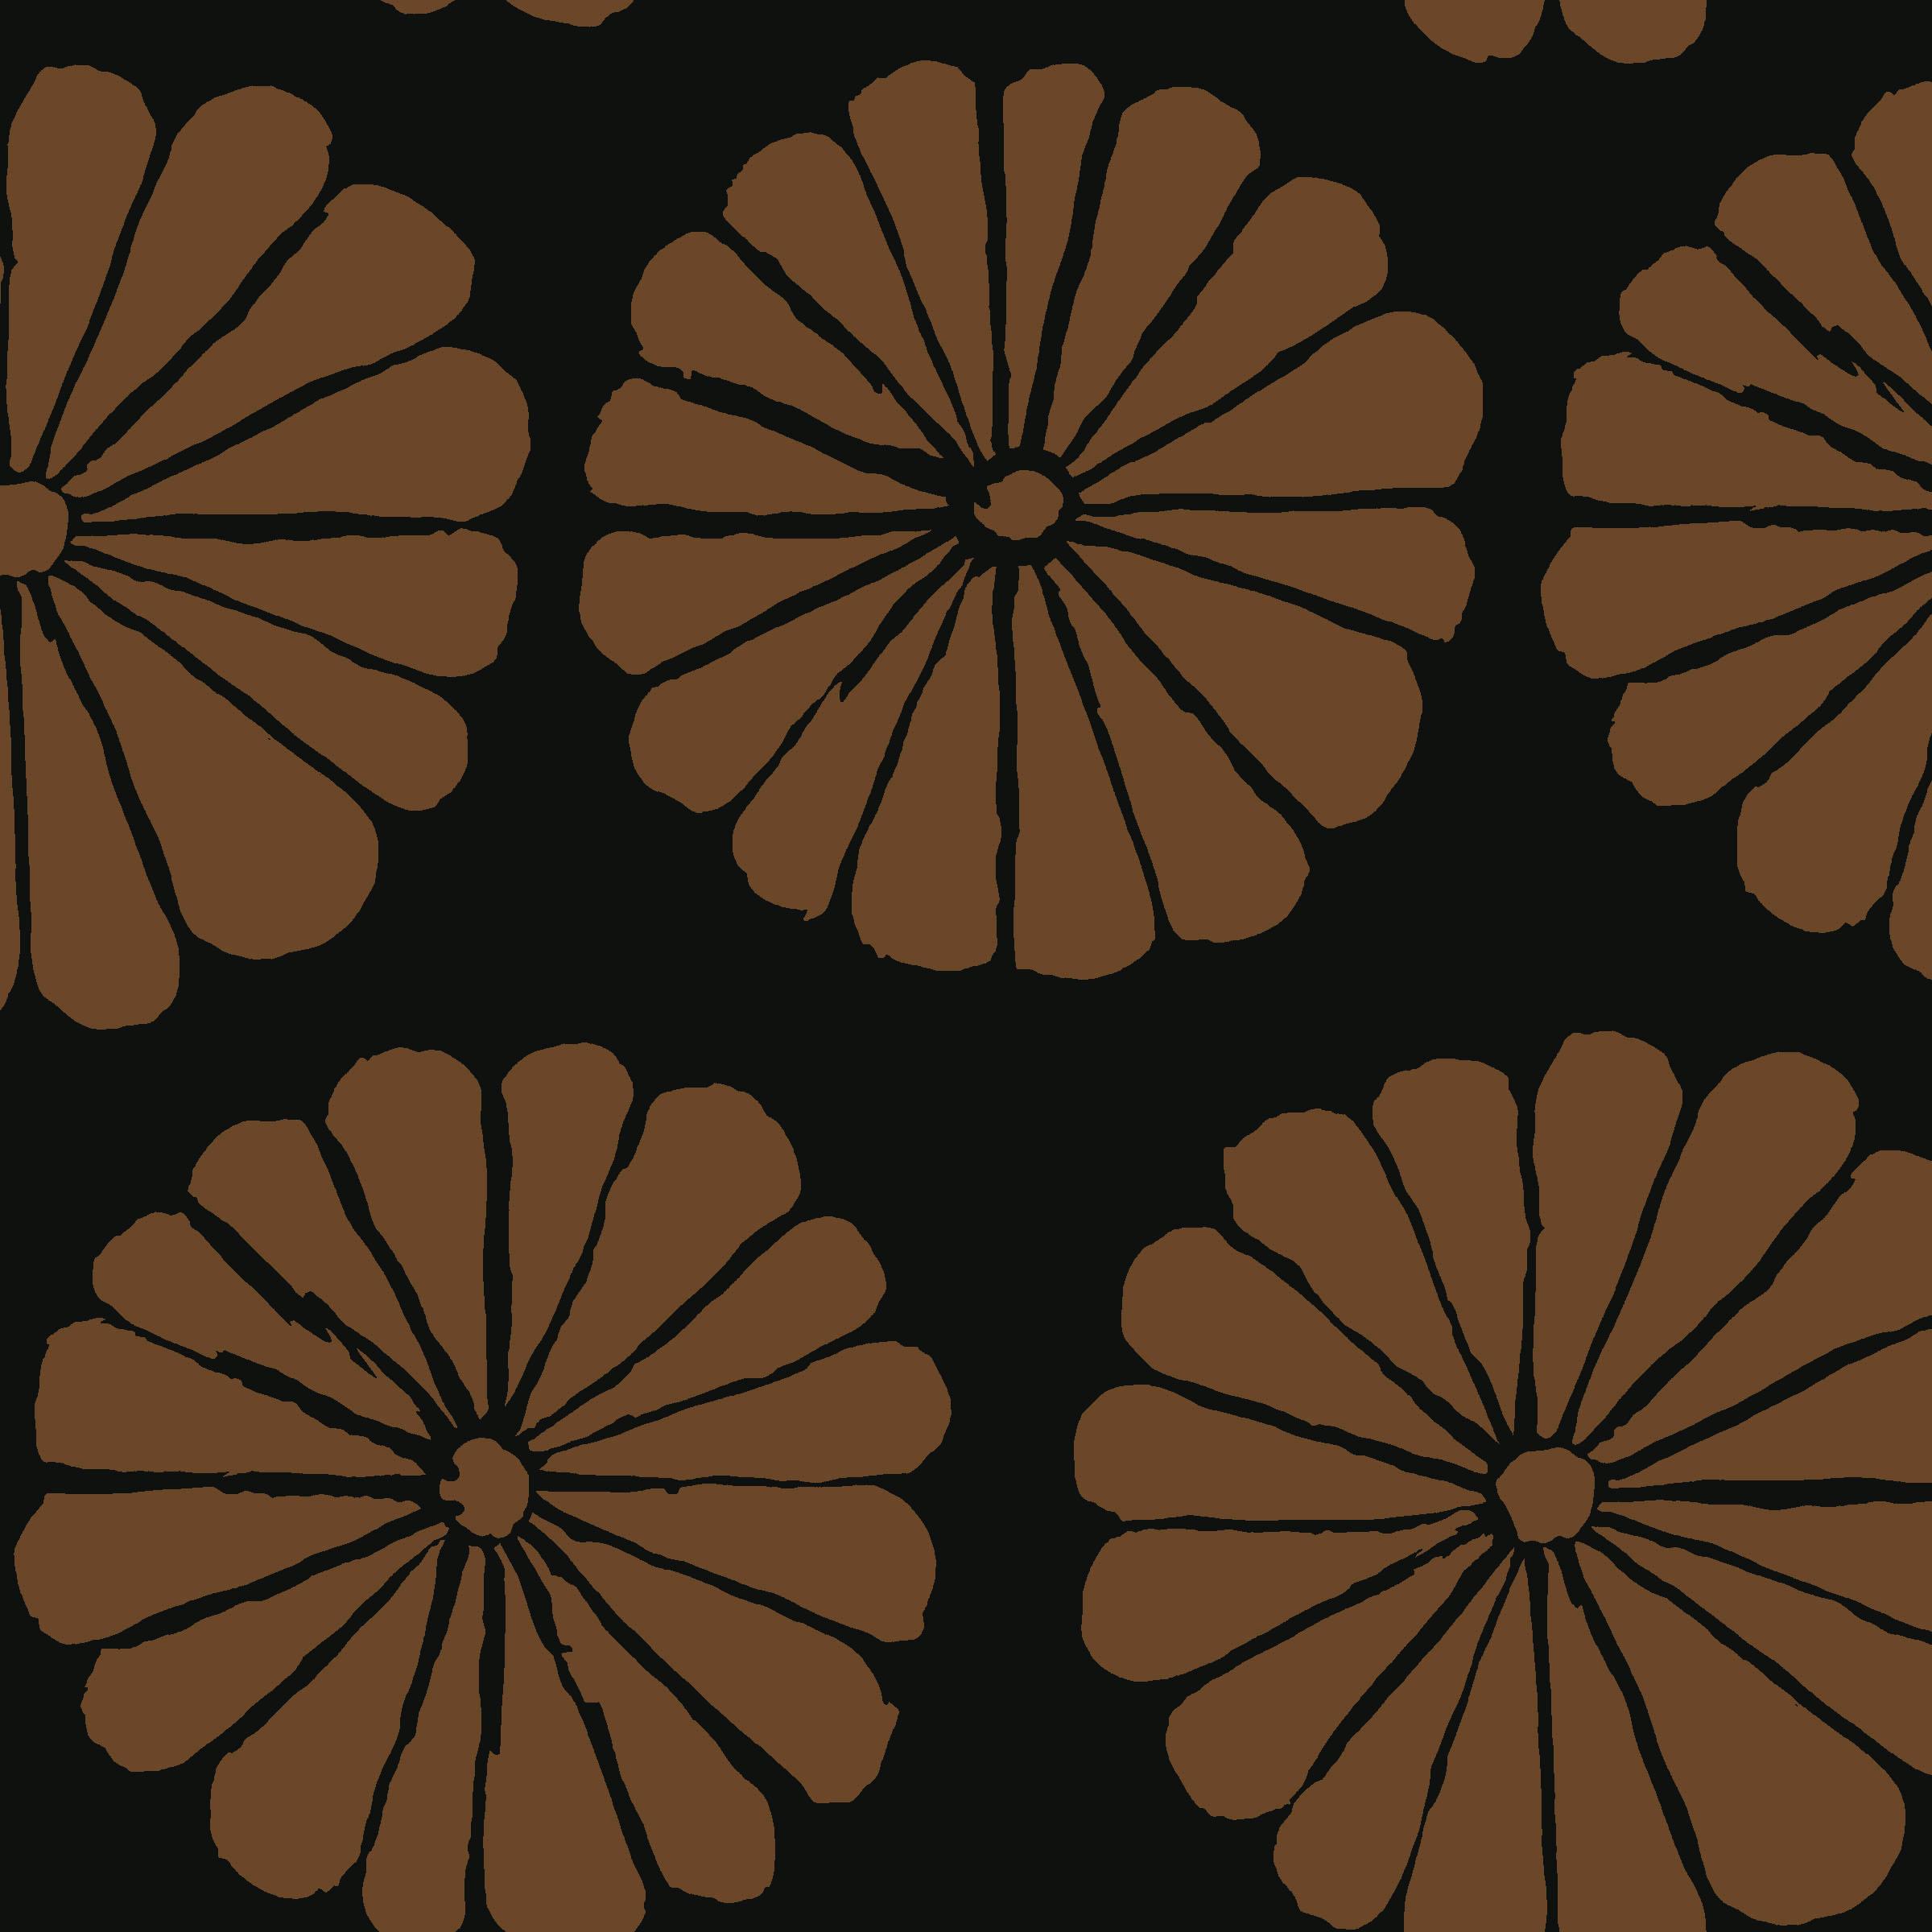 Damask Flower - PWGP183 - Brown